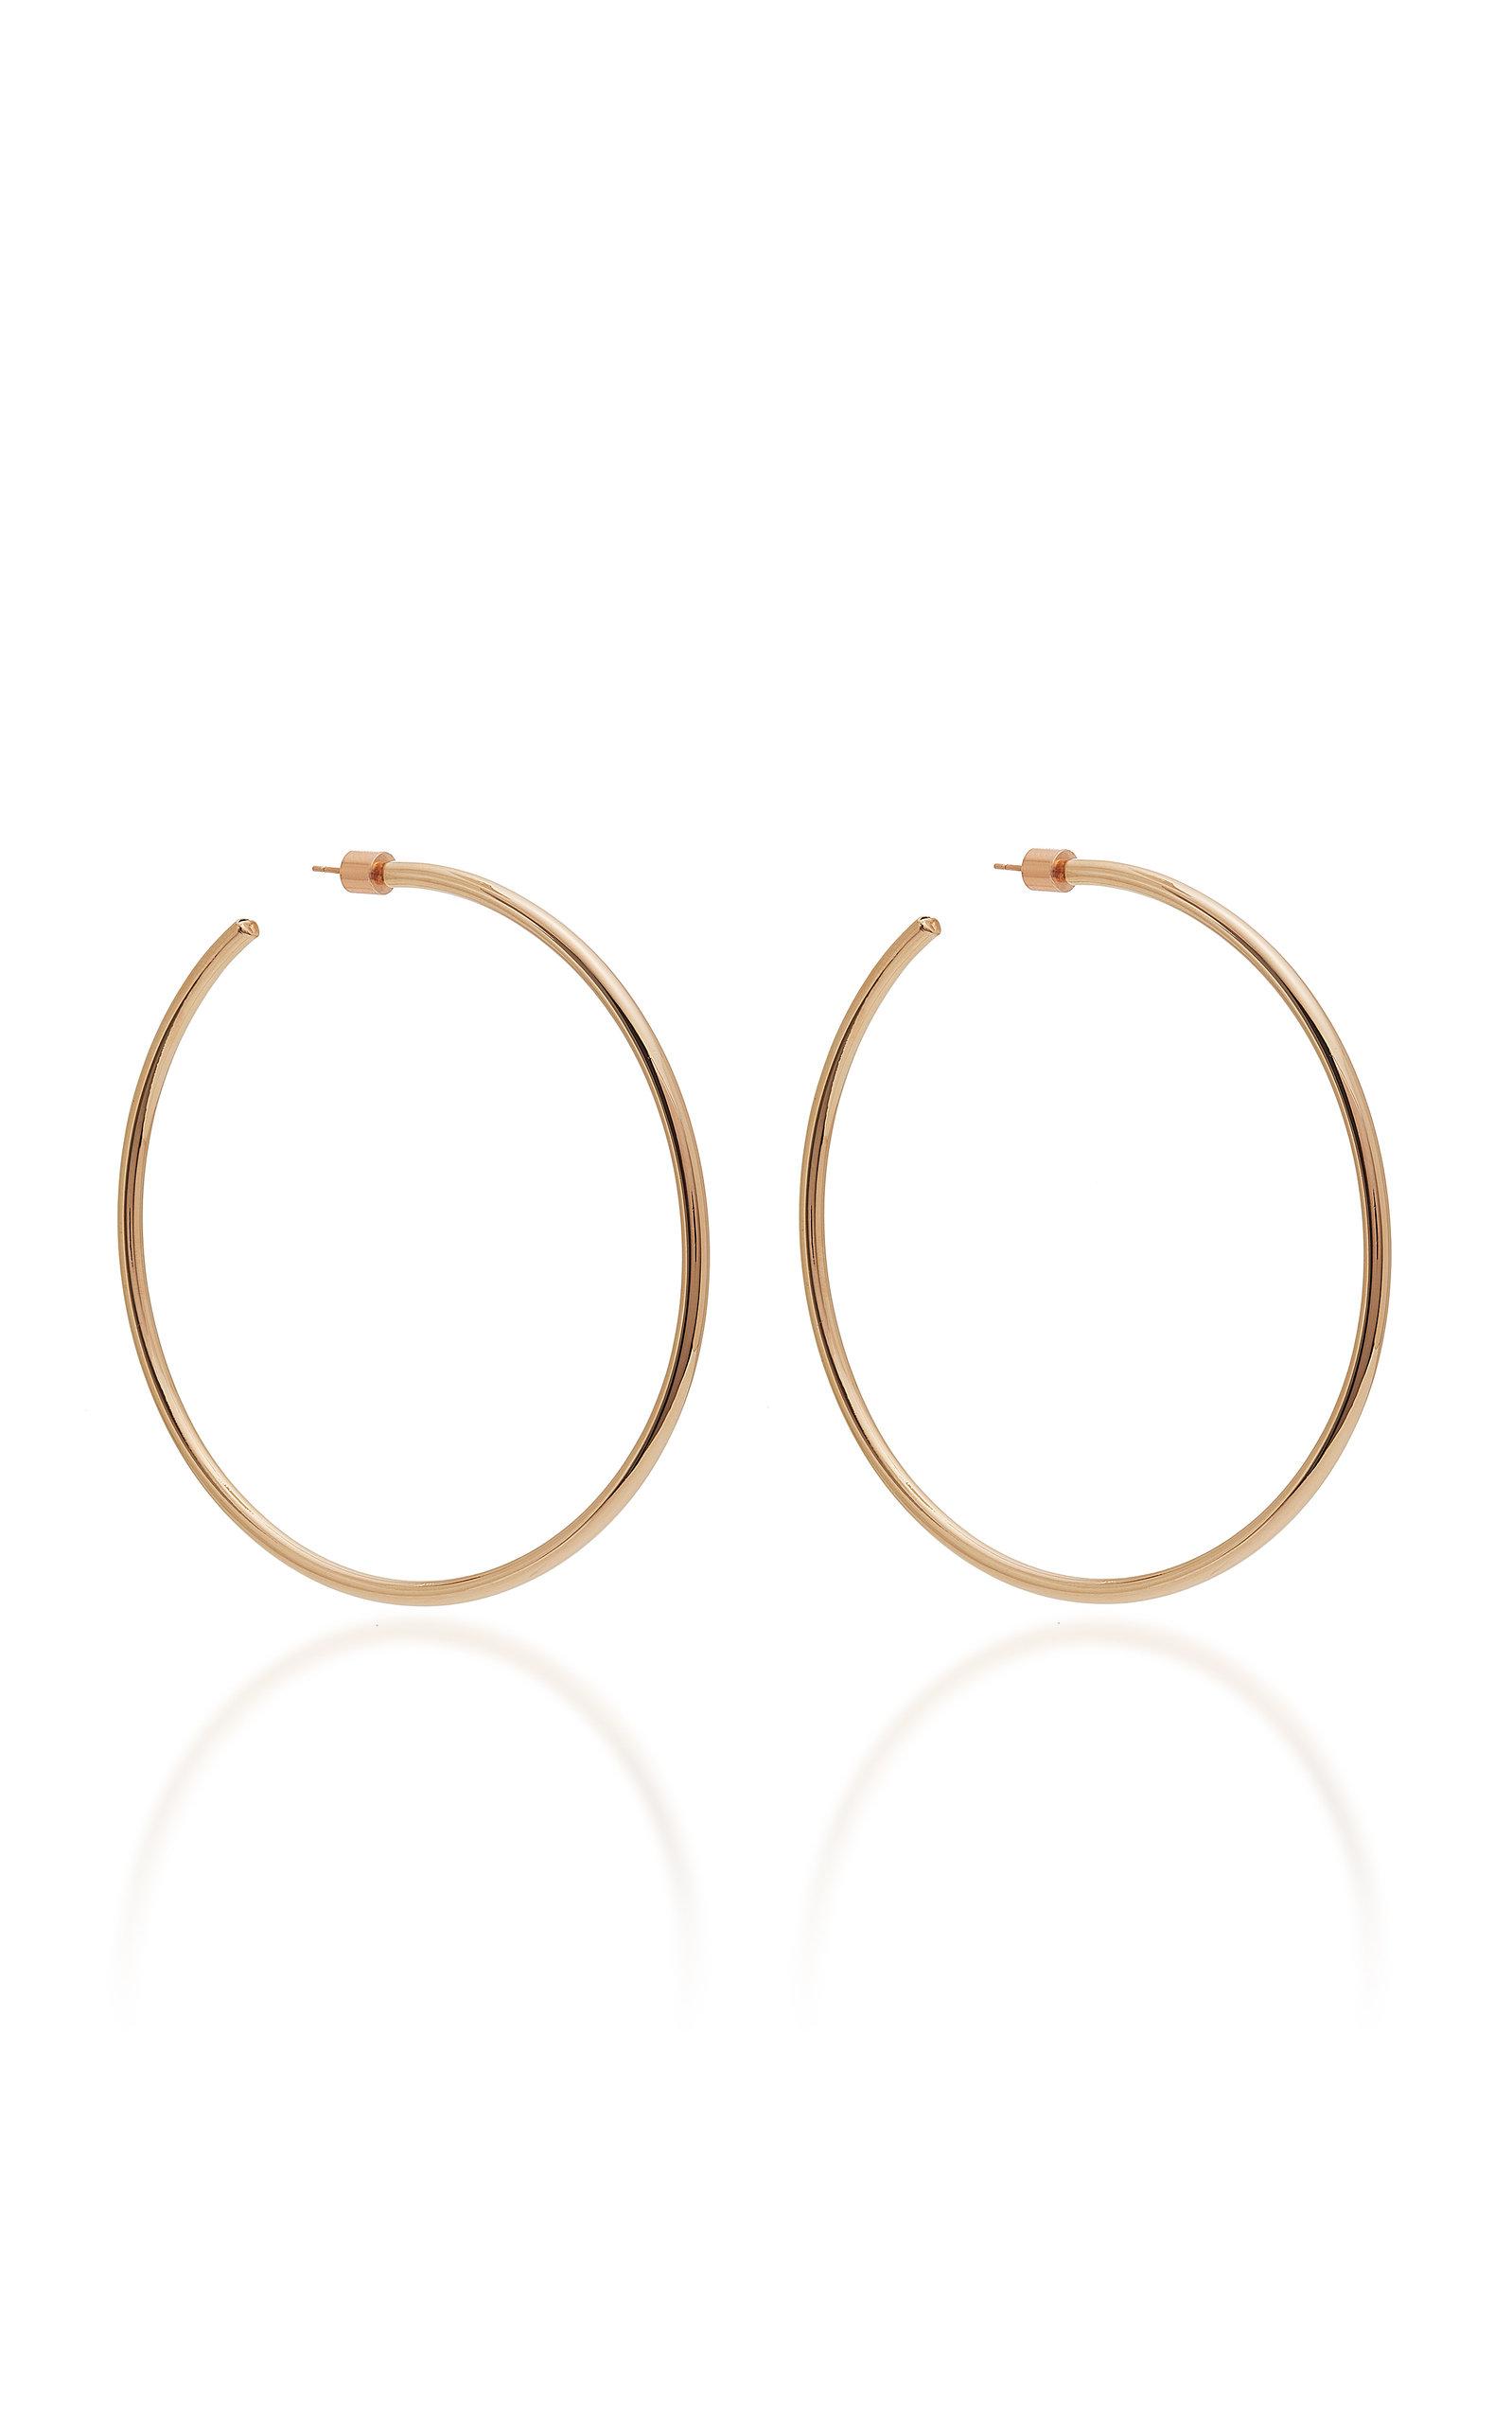 Women's Classic 14K Rose Gold-Plated Hoop Earrings